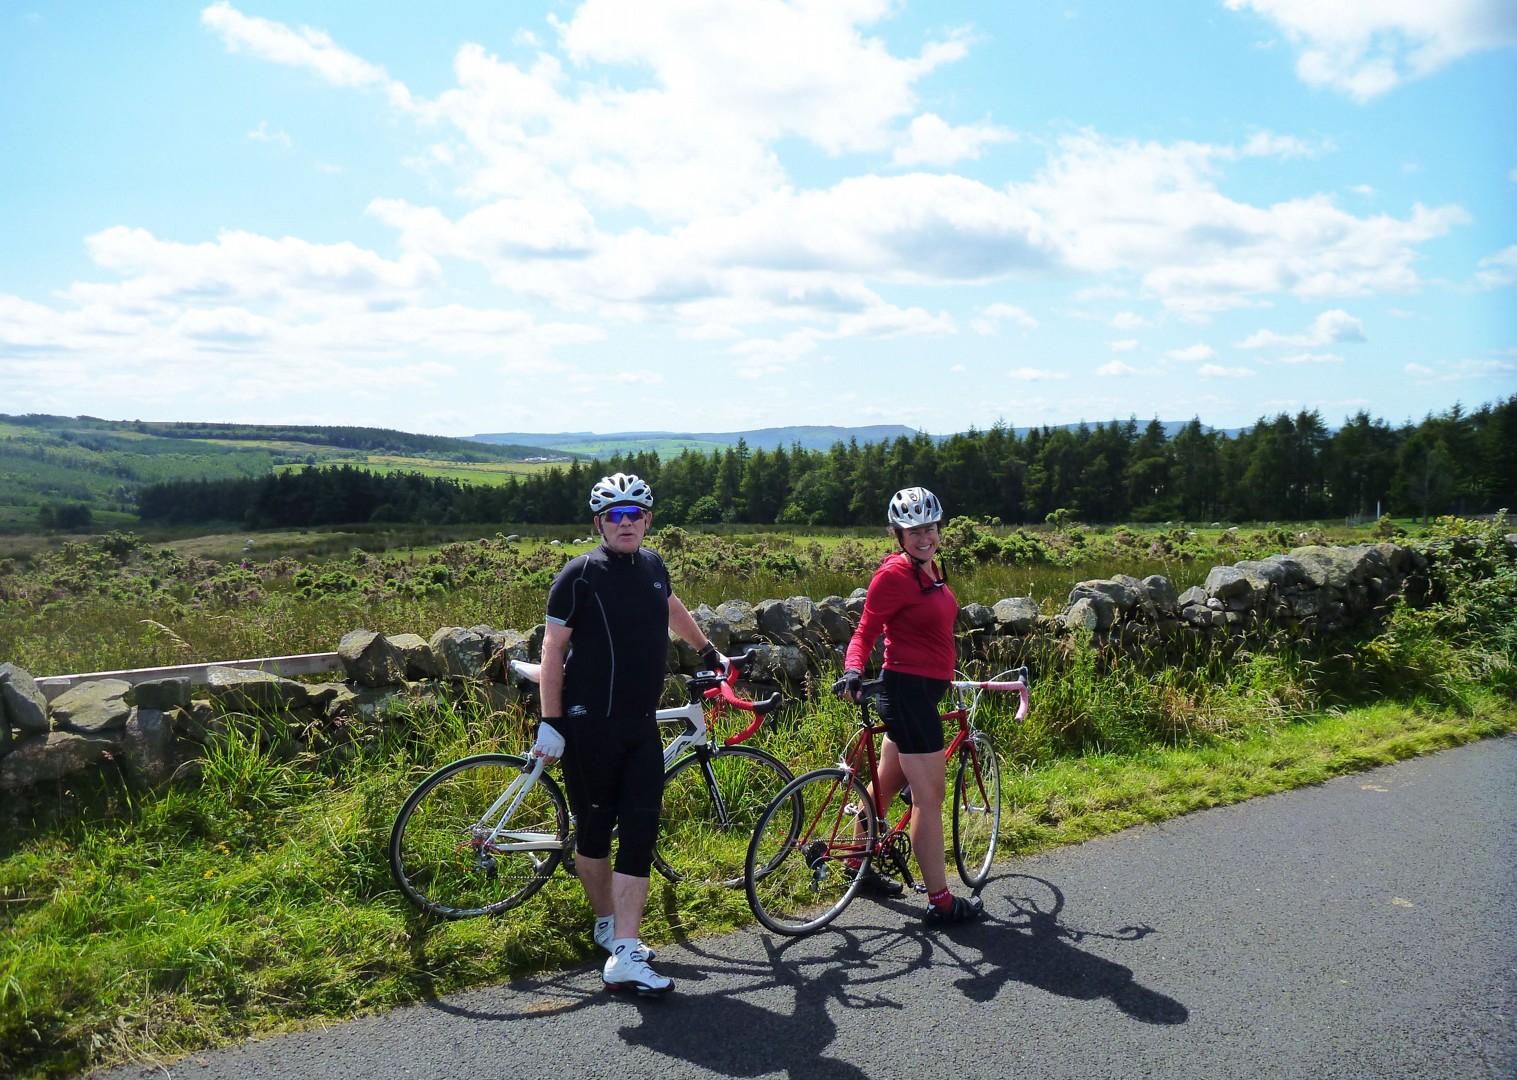 group-cycling-in-northumberland.jpg - UK - Northumberland - Road Cycling